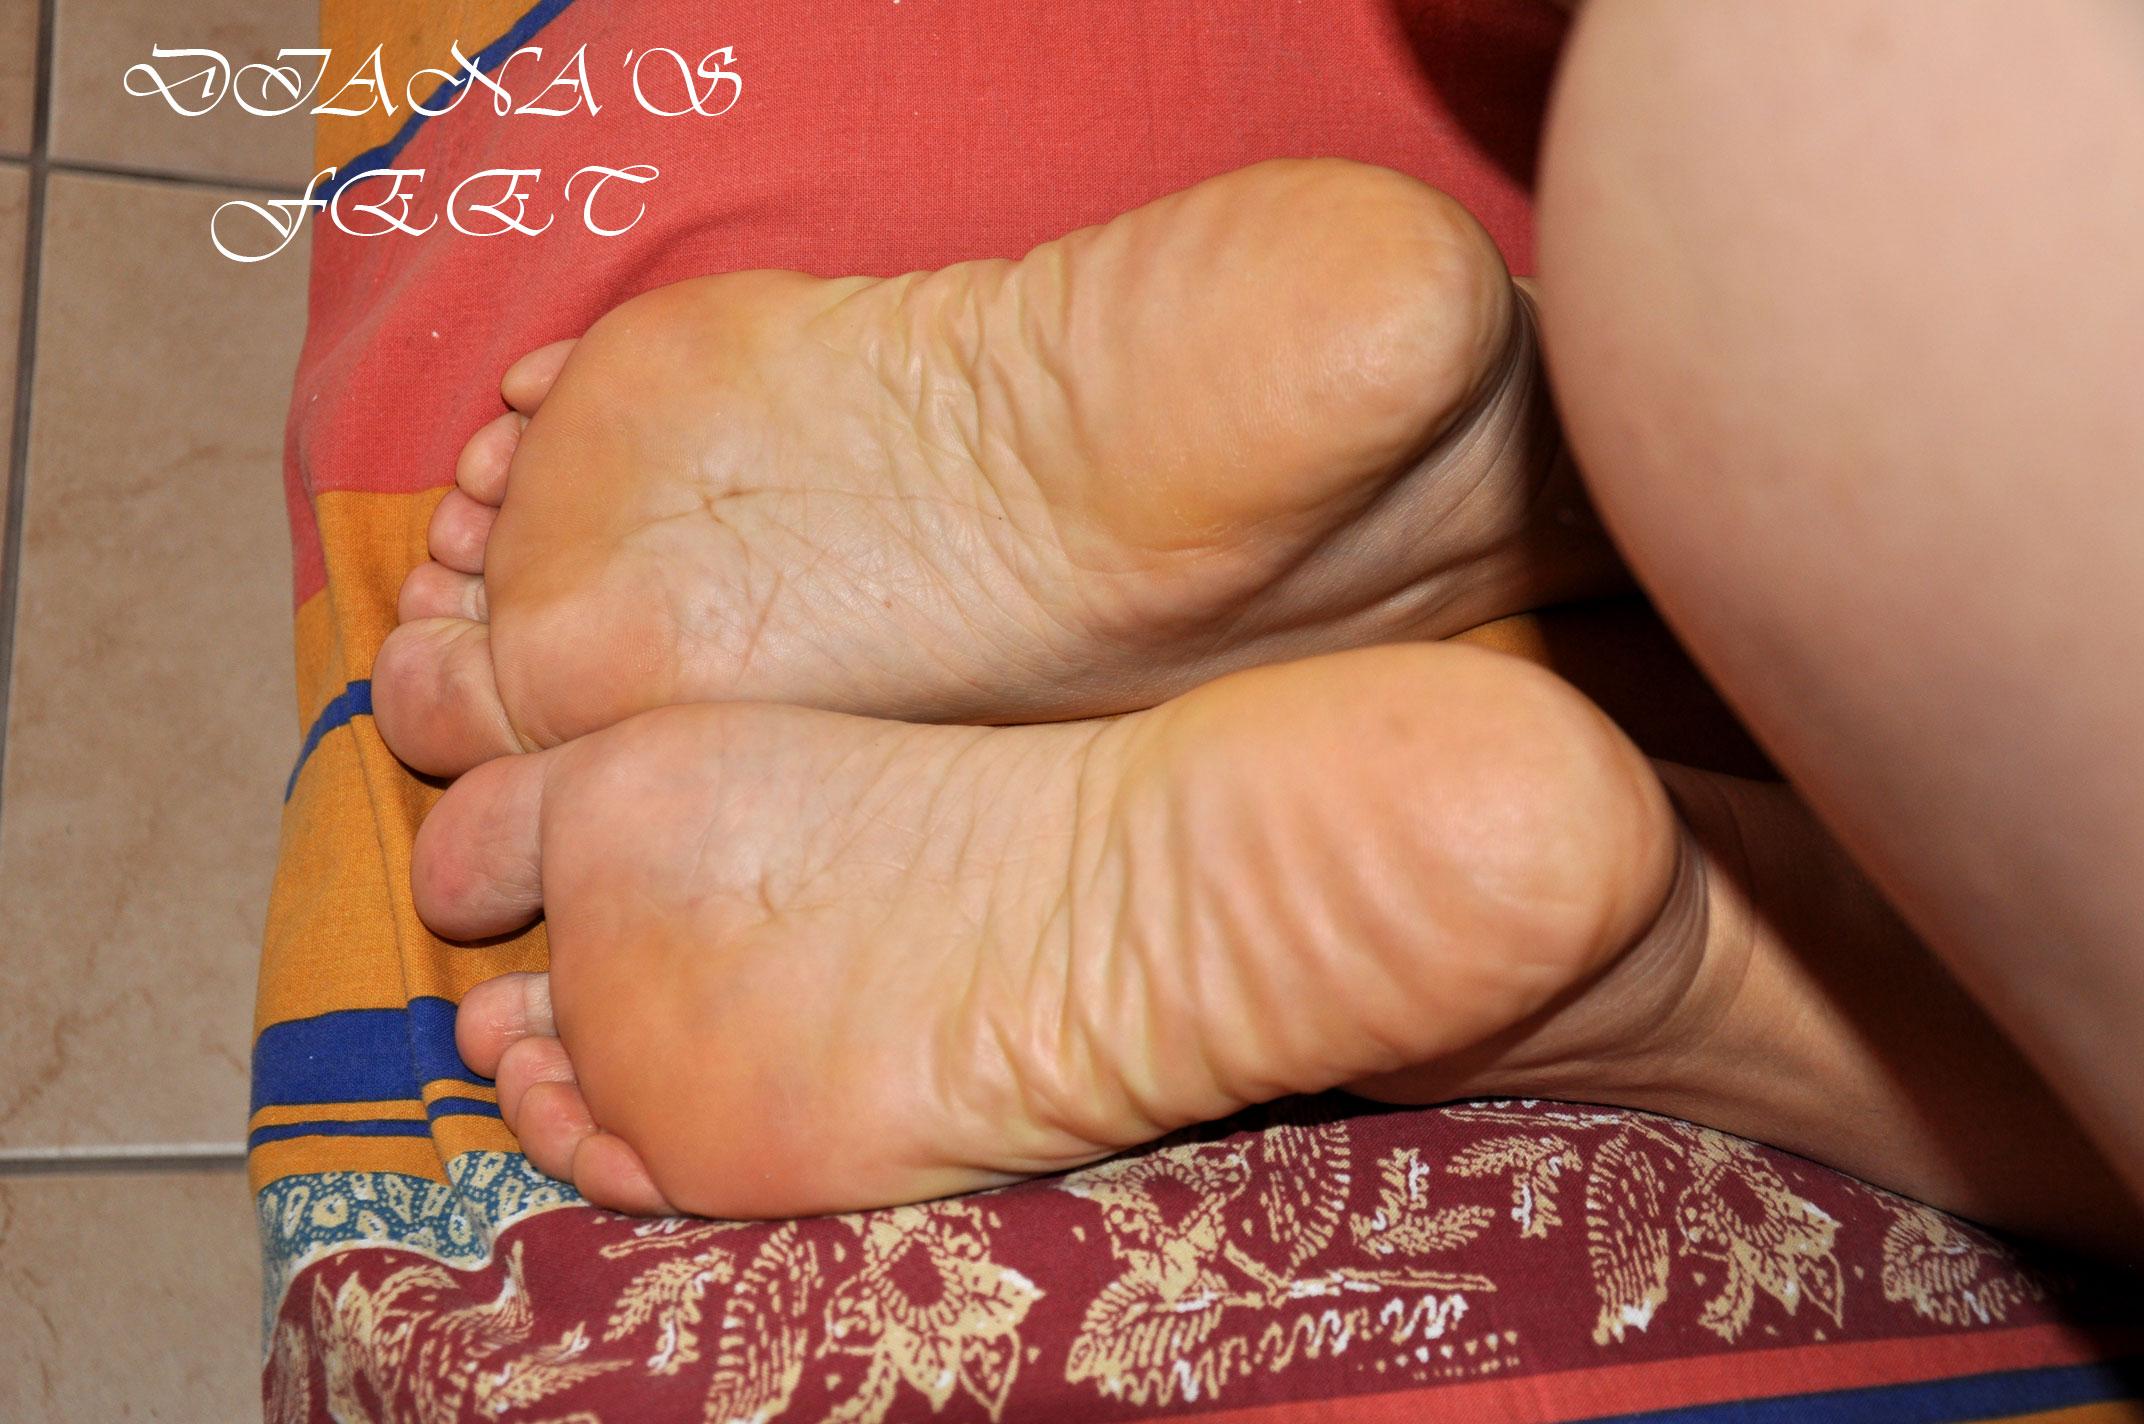 Diana 's feet 171114101757589124